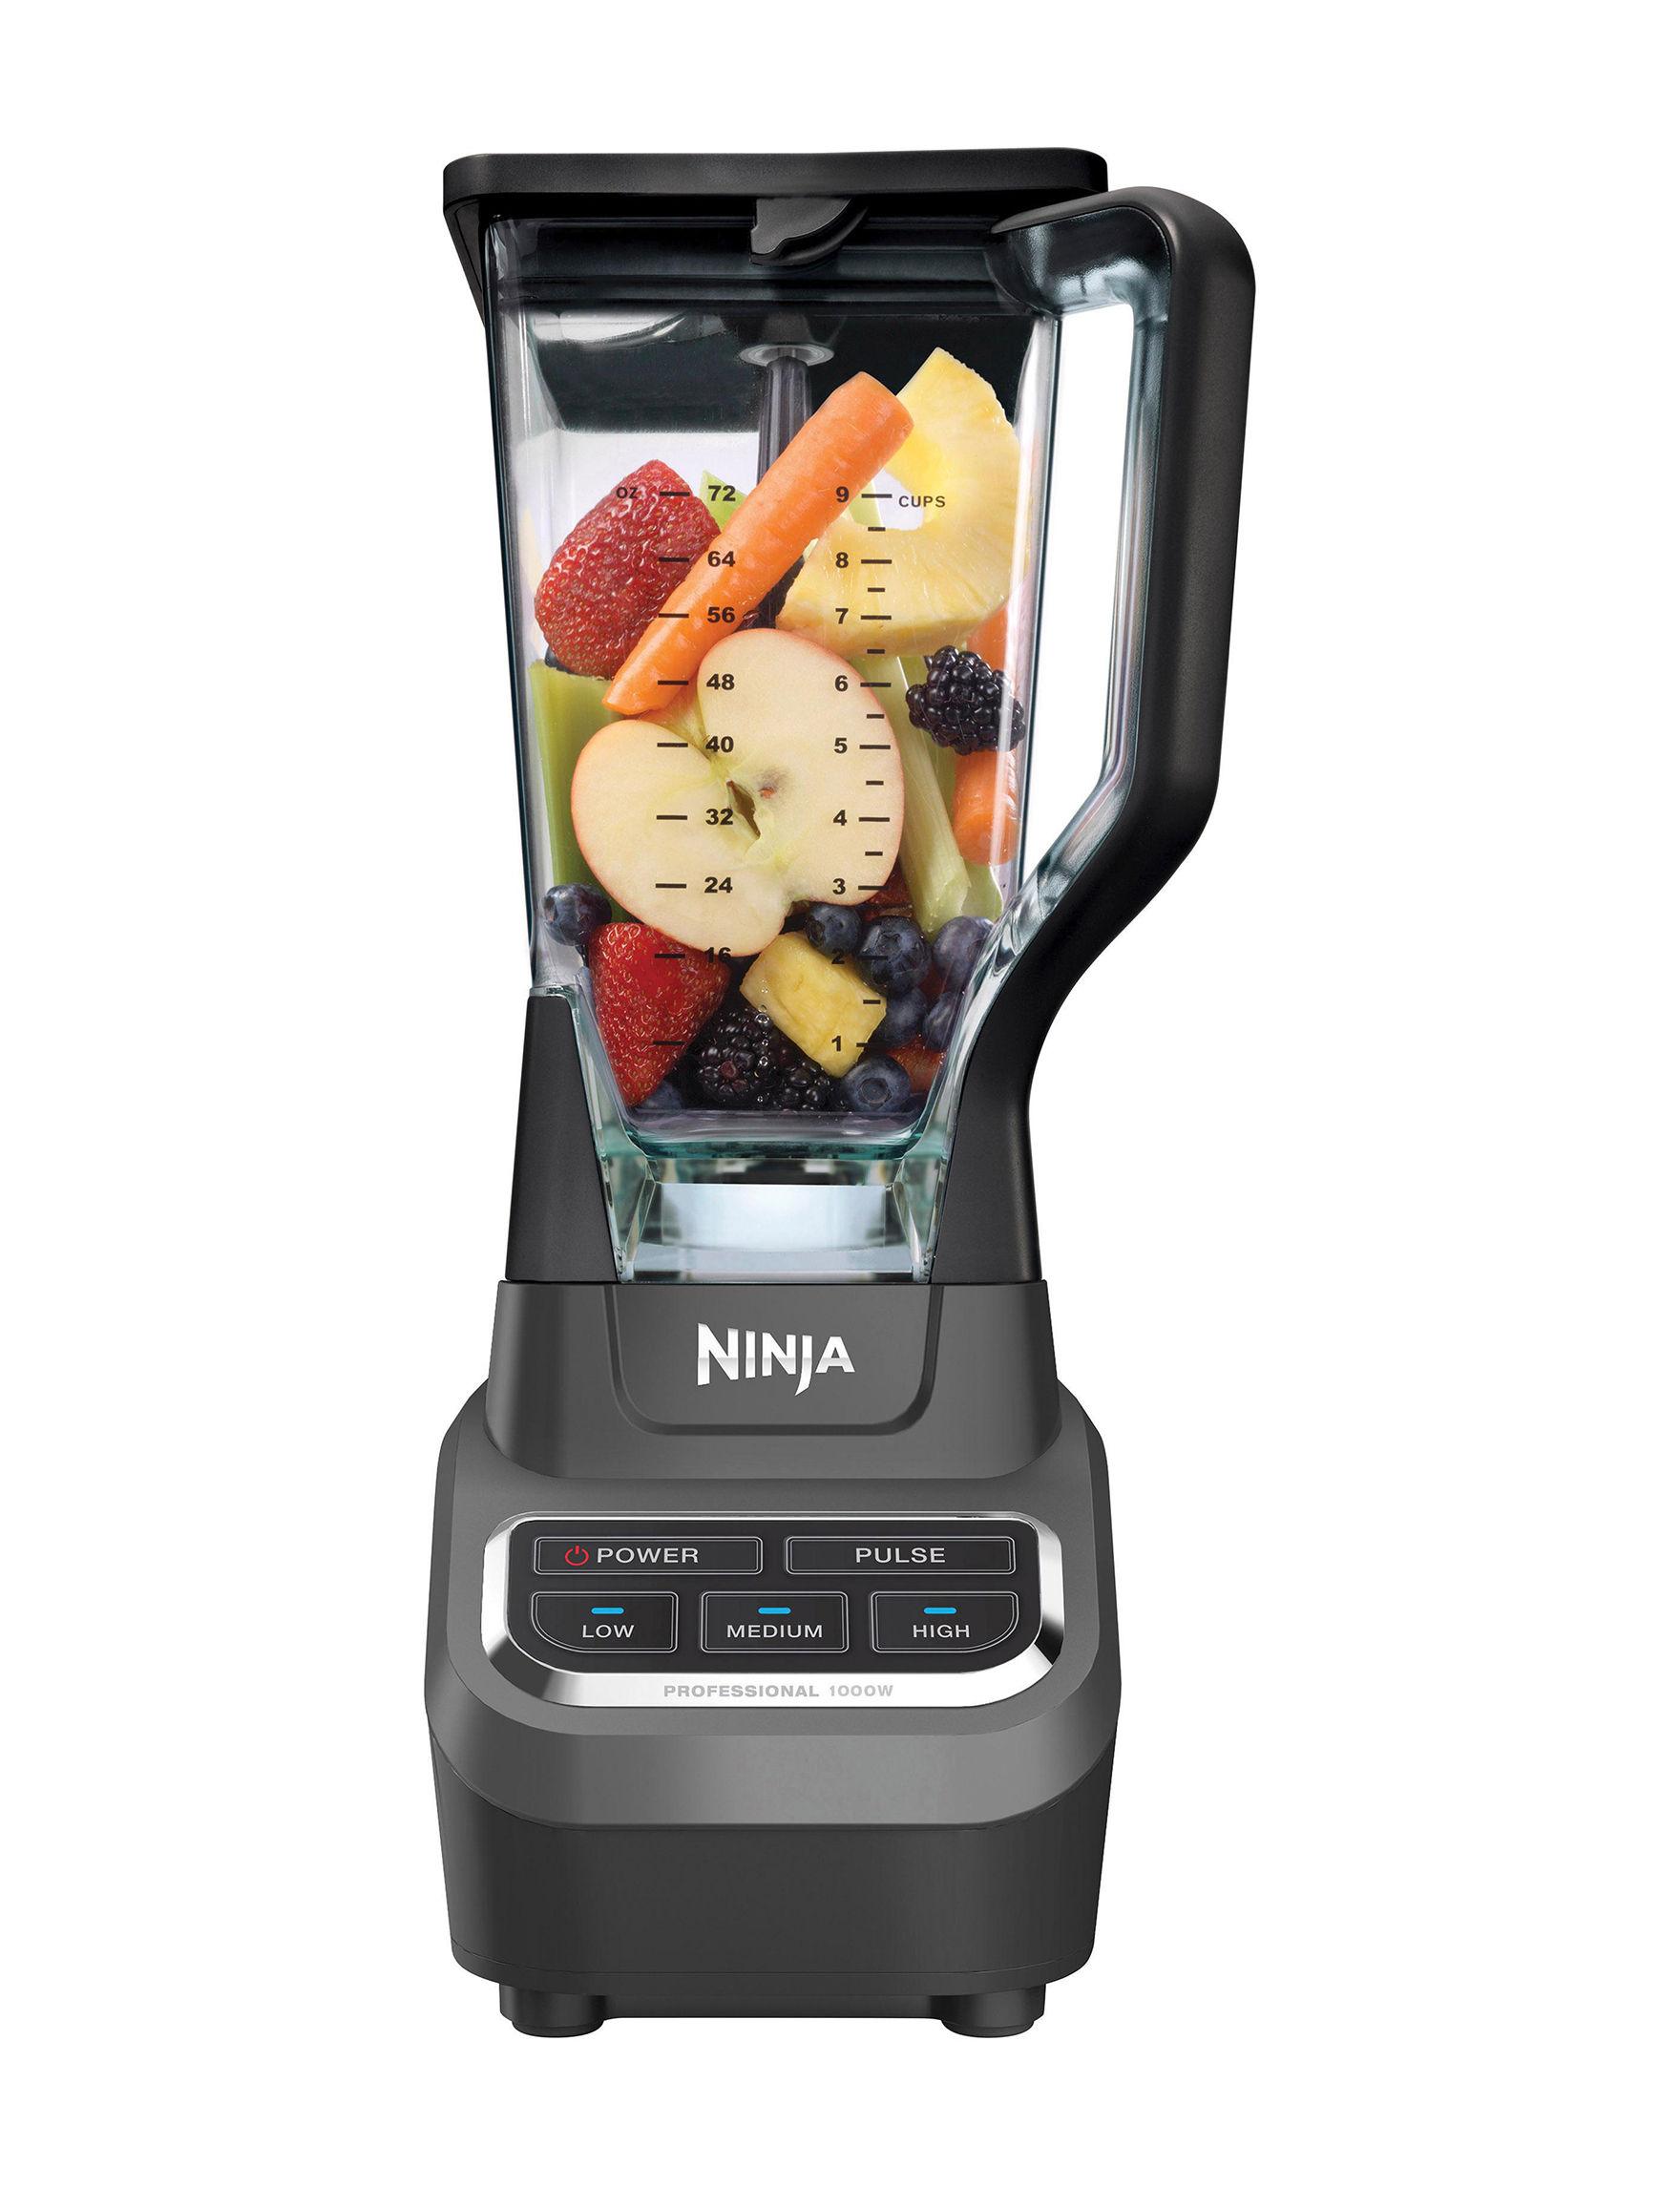 Ninja Black Kitchen Appliances